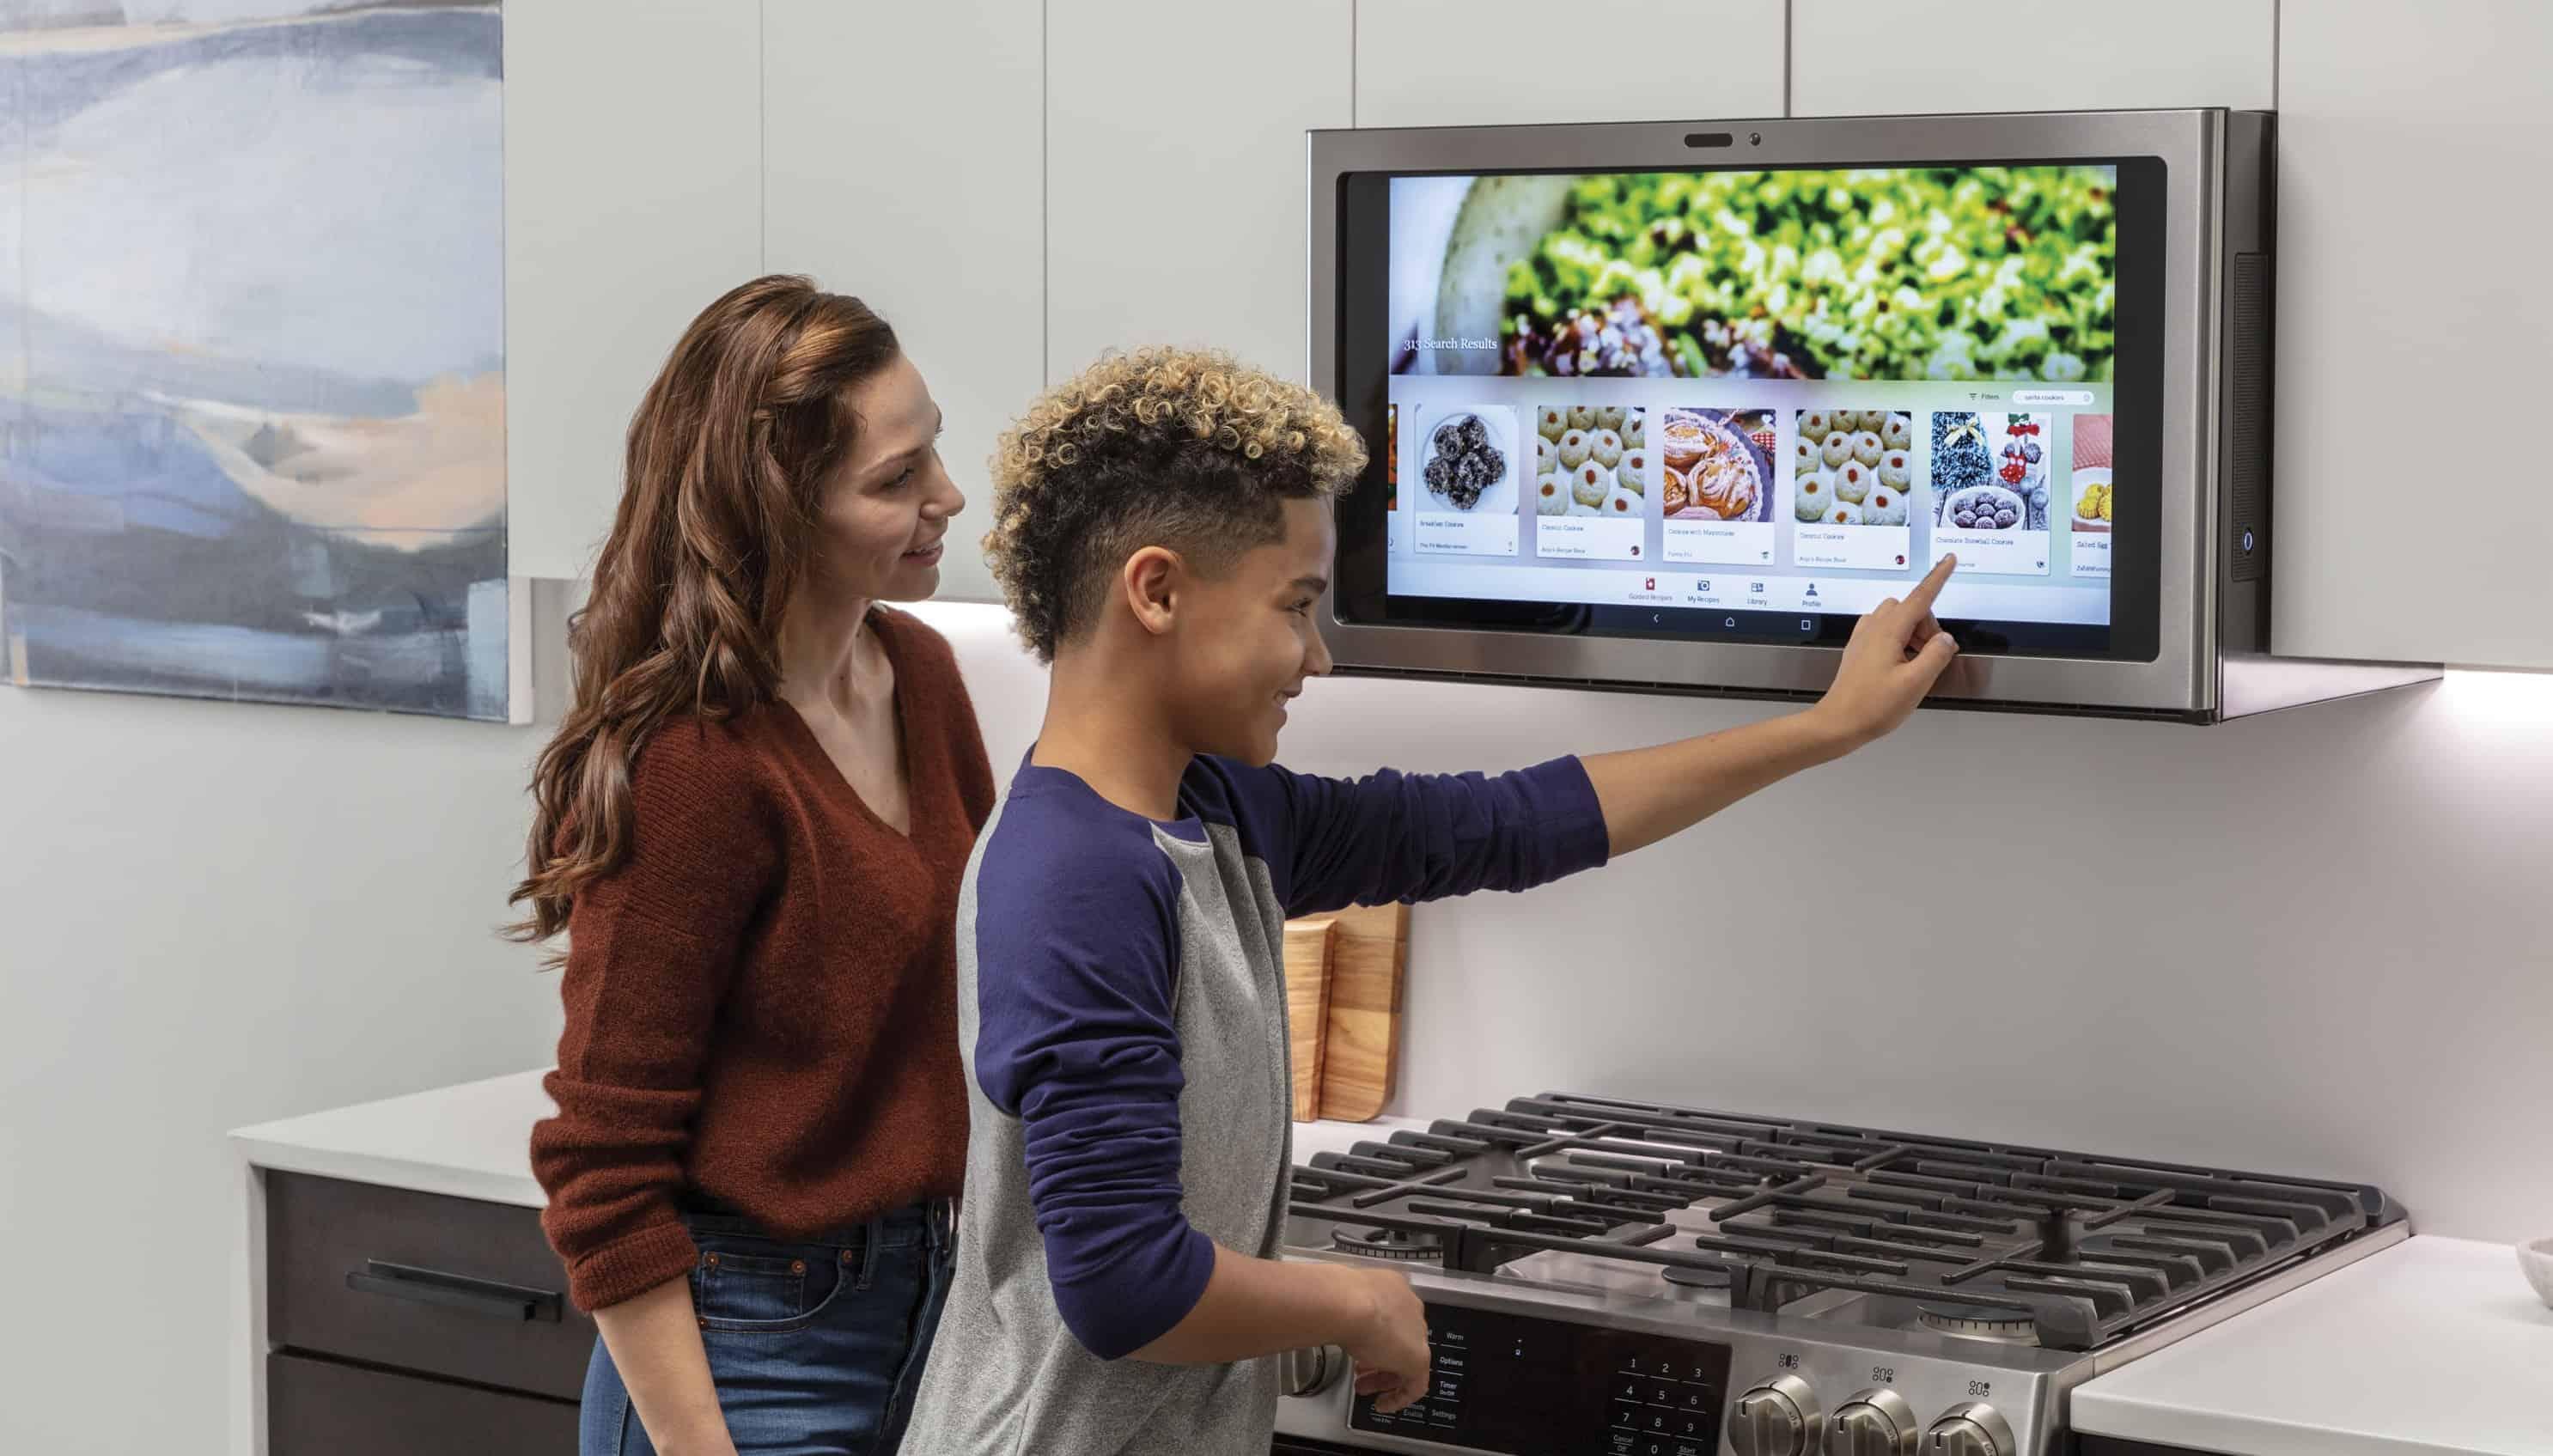 GE Kitchen Hub Lifestyle CES 2019